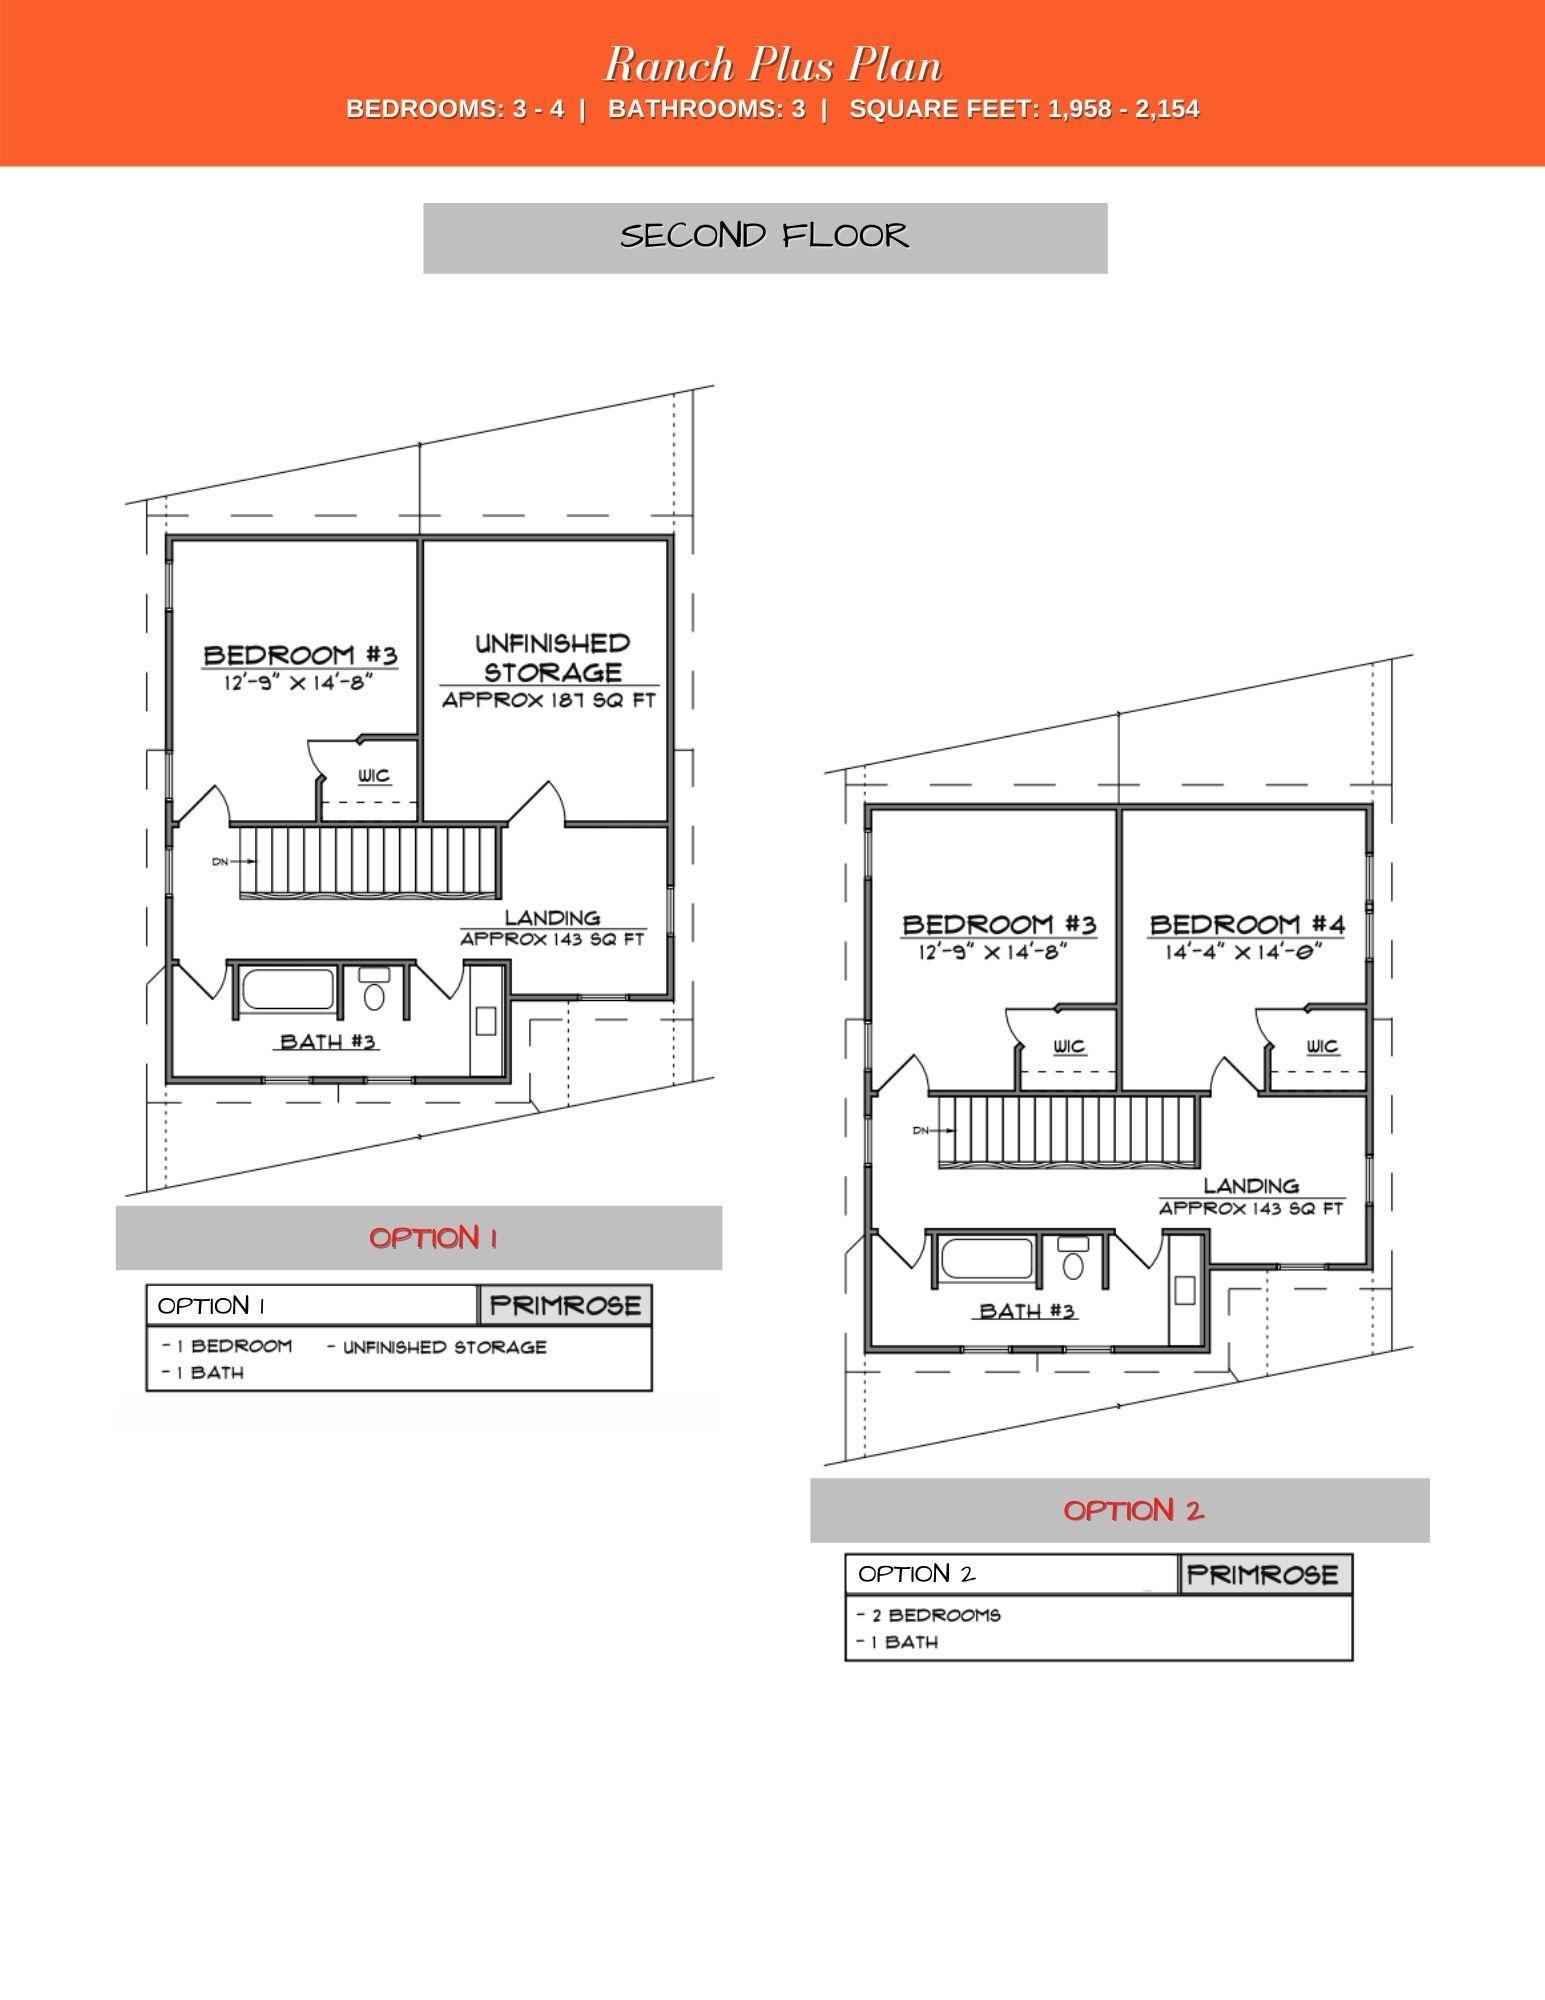 The Walk at East Village's Primrose 2nd Floor Plan